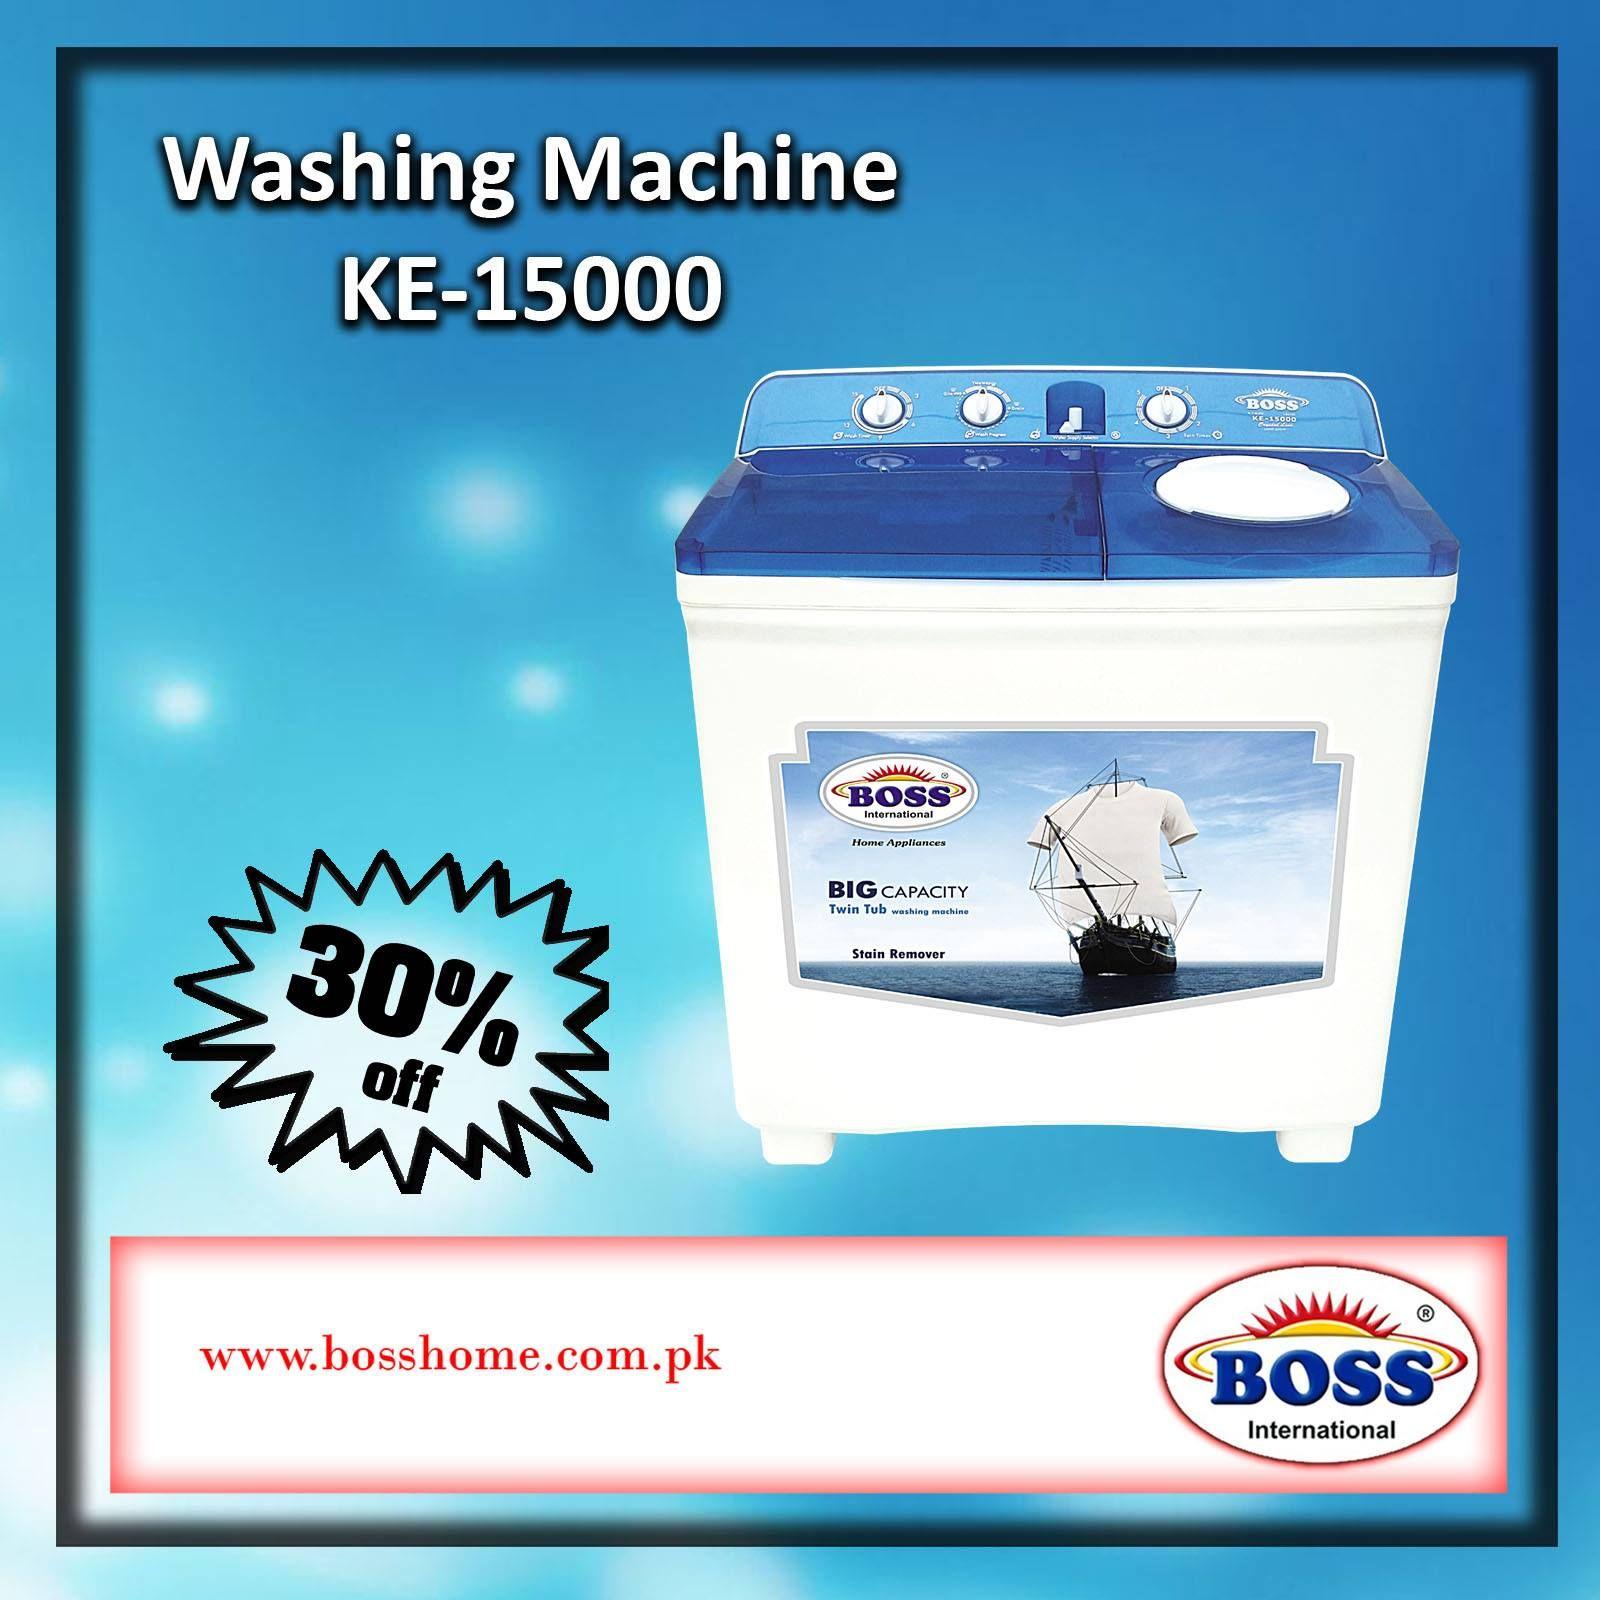 Pin by BOSS Home Appliances on BOSS washing machnes   Pinterest ...